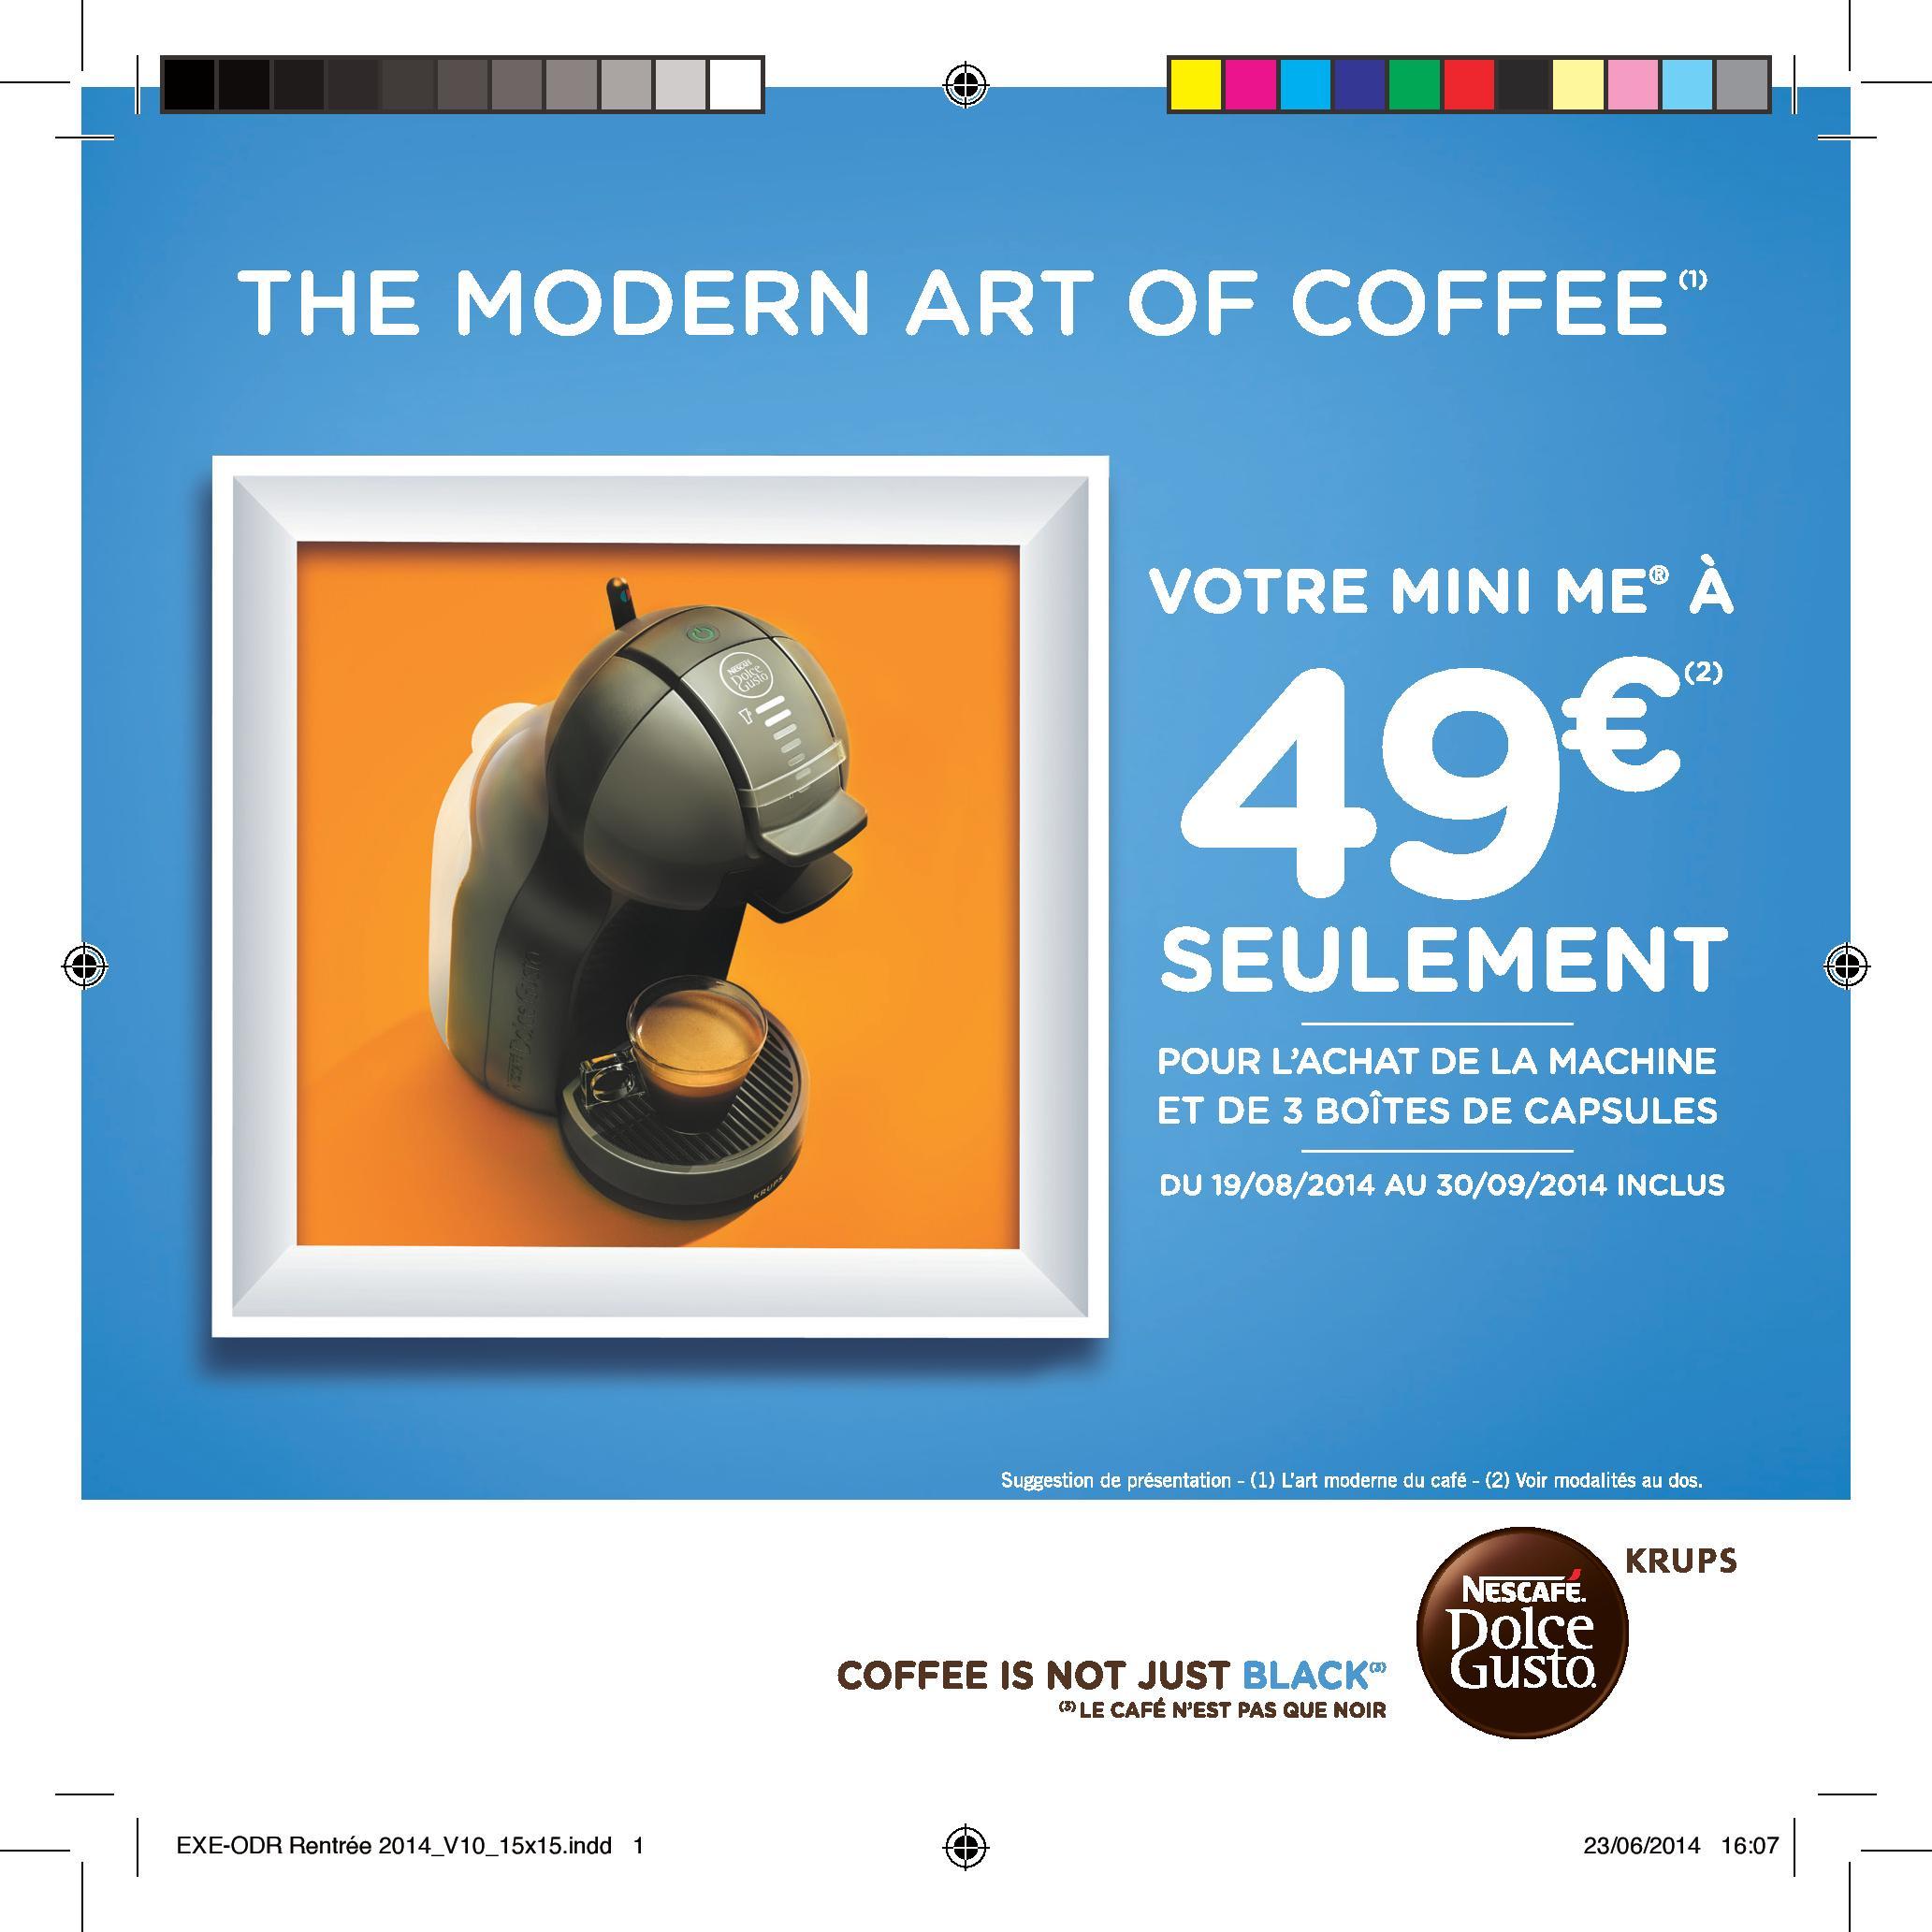 offre de remboursement odr nescaf dolce gusto votre machine mini me 49. Black Bedroom Furniture Sets. Home Design Ideas